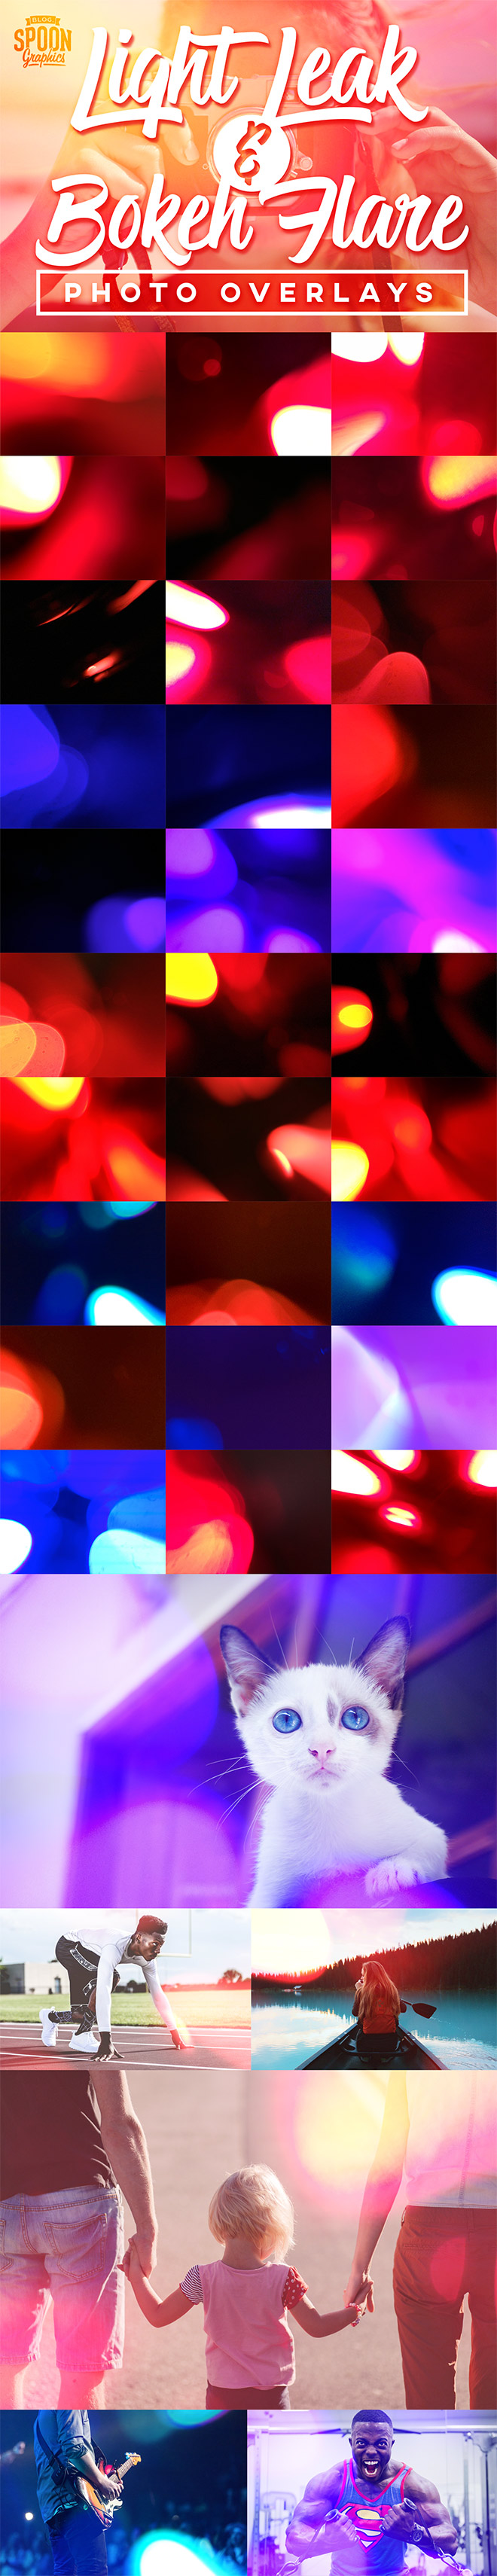 30 Free Light Leak and Bokeh Flare Photo Overlays